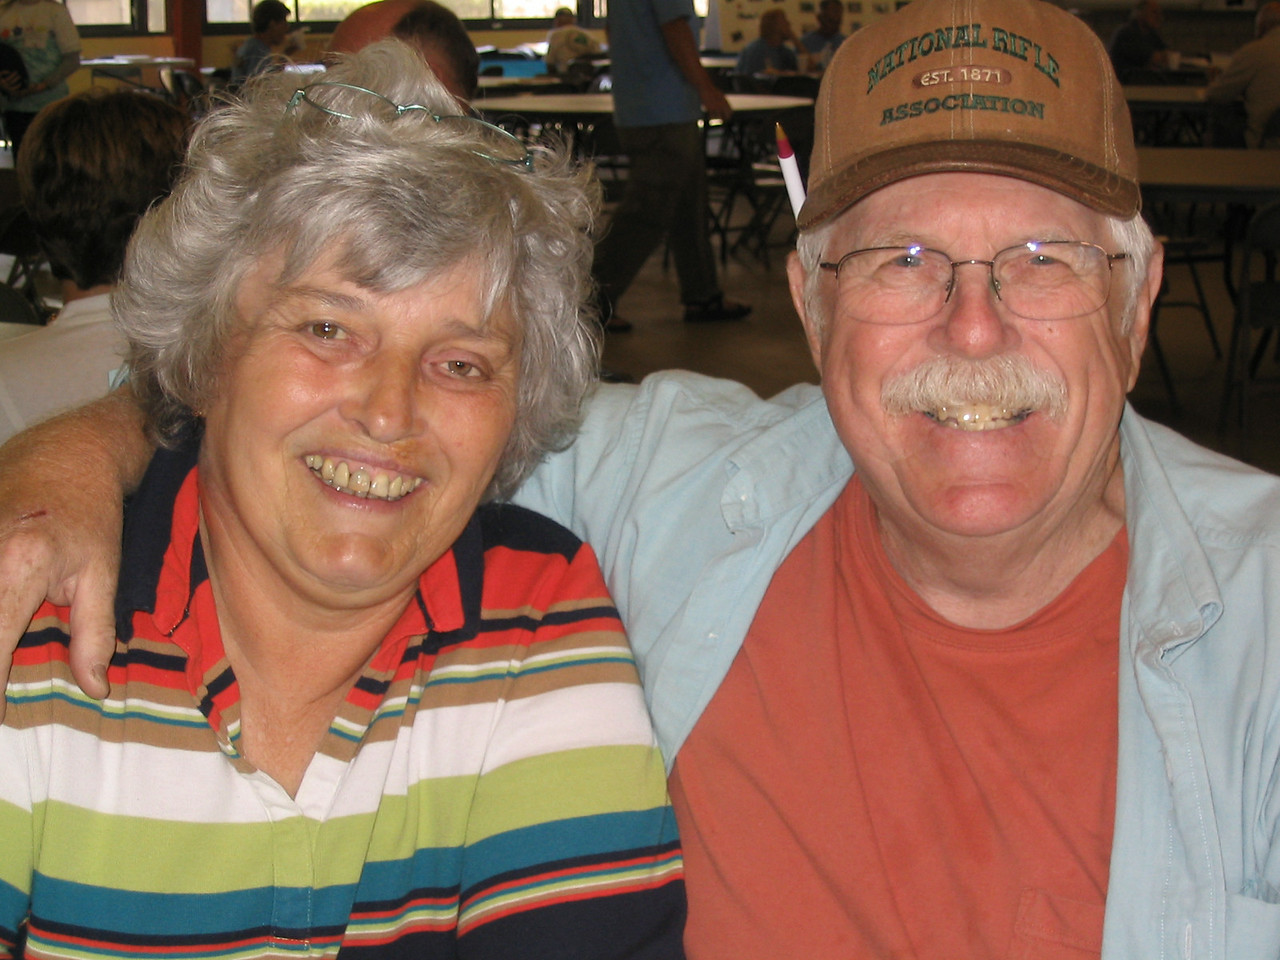 Carol Ann and Fred Schiller<br /> PHOTO CREDIT: Diane Wilkins / Florida Trail Association